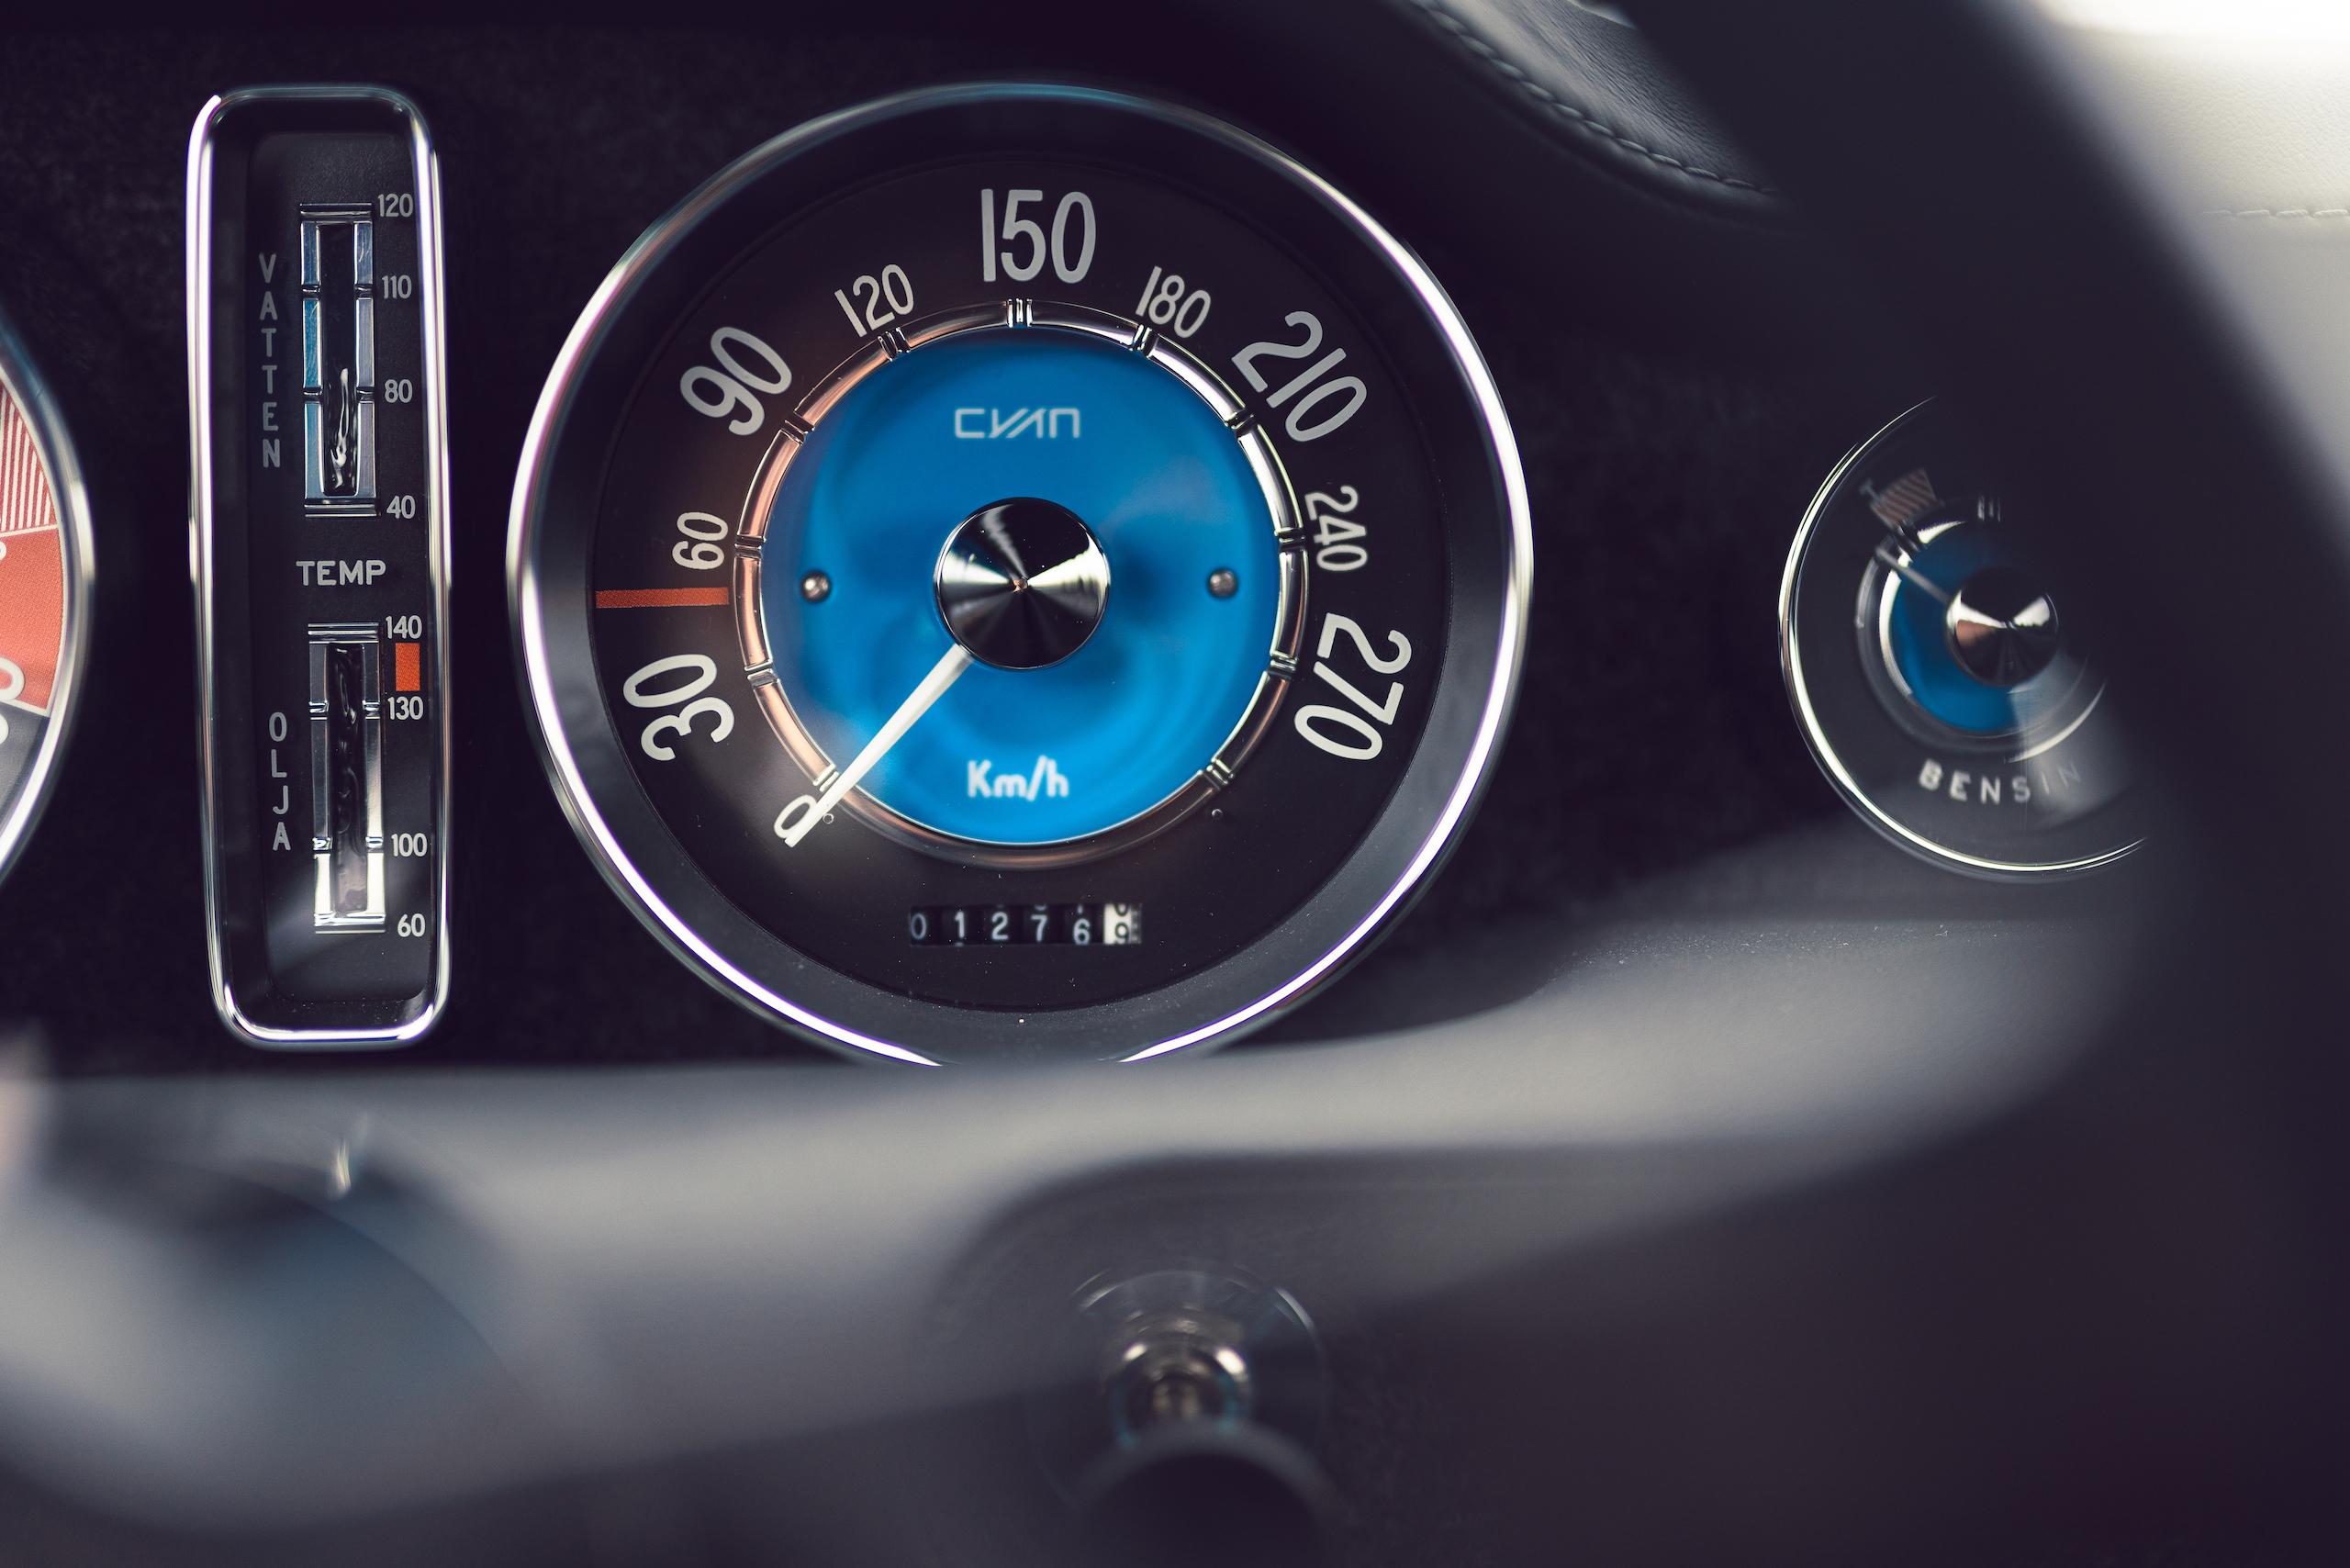 CYAN RACING P1800 gauge detail